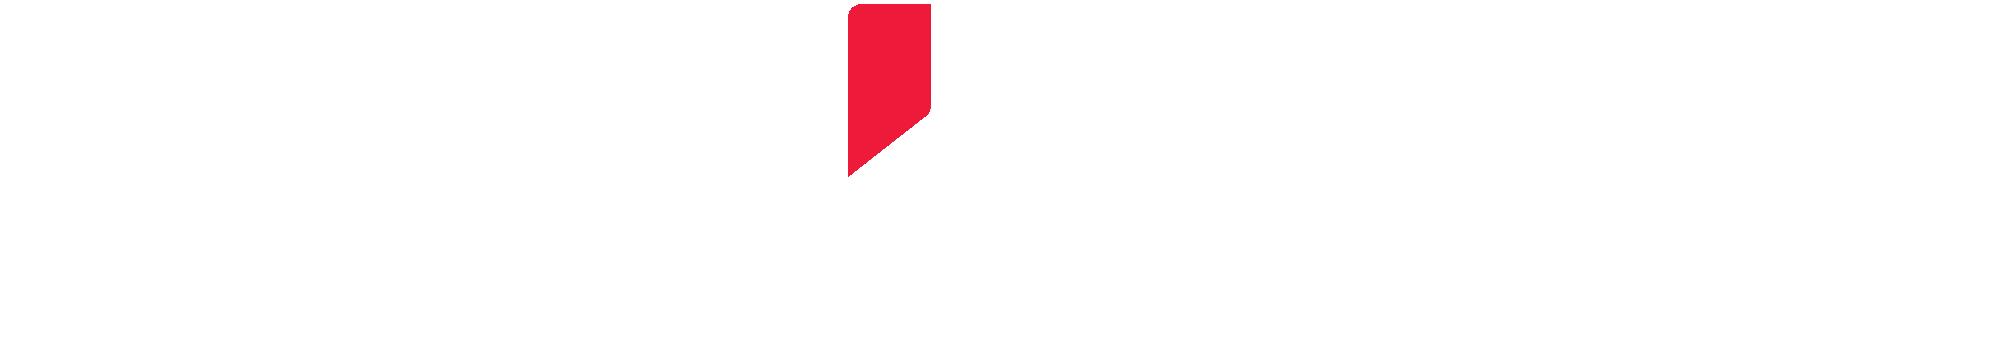 2000px-Fujifilm_logo.png